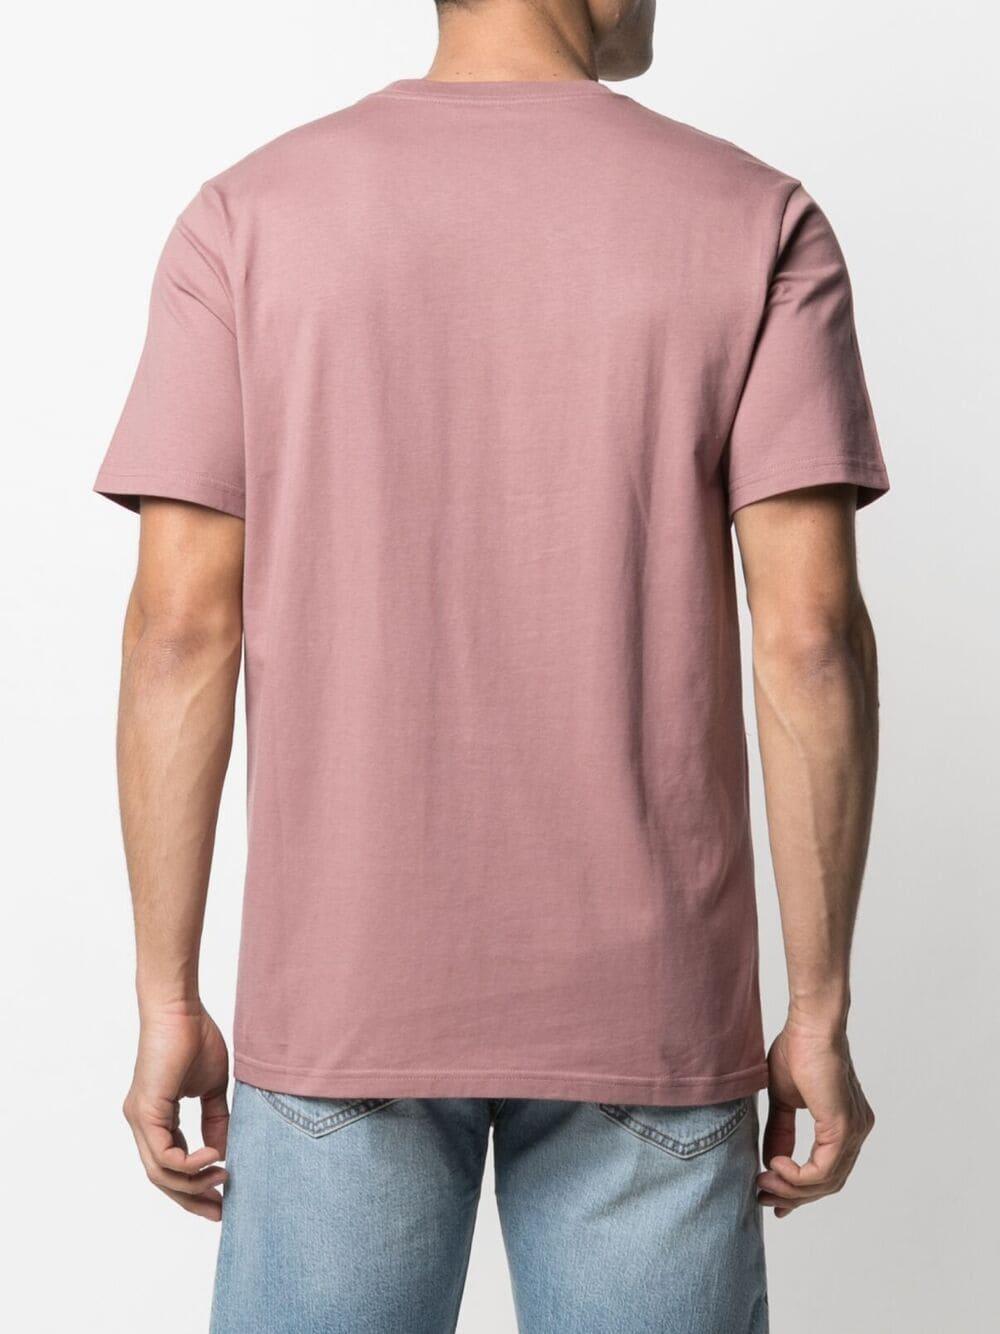 POCKET T-SHIRT CARHARTT WIP | T-shirts | I0220910AE.00